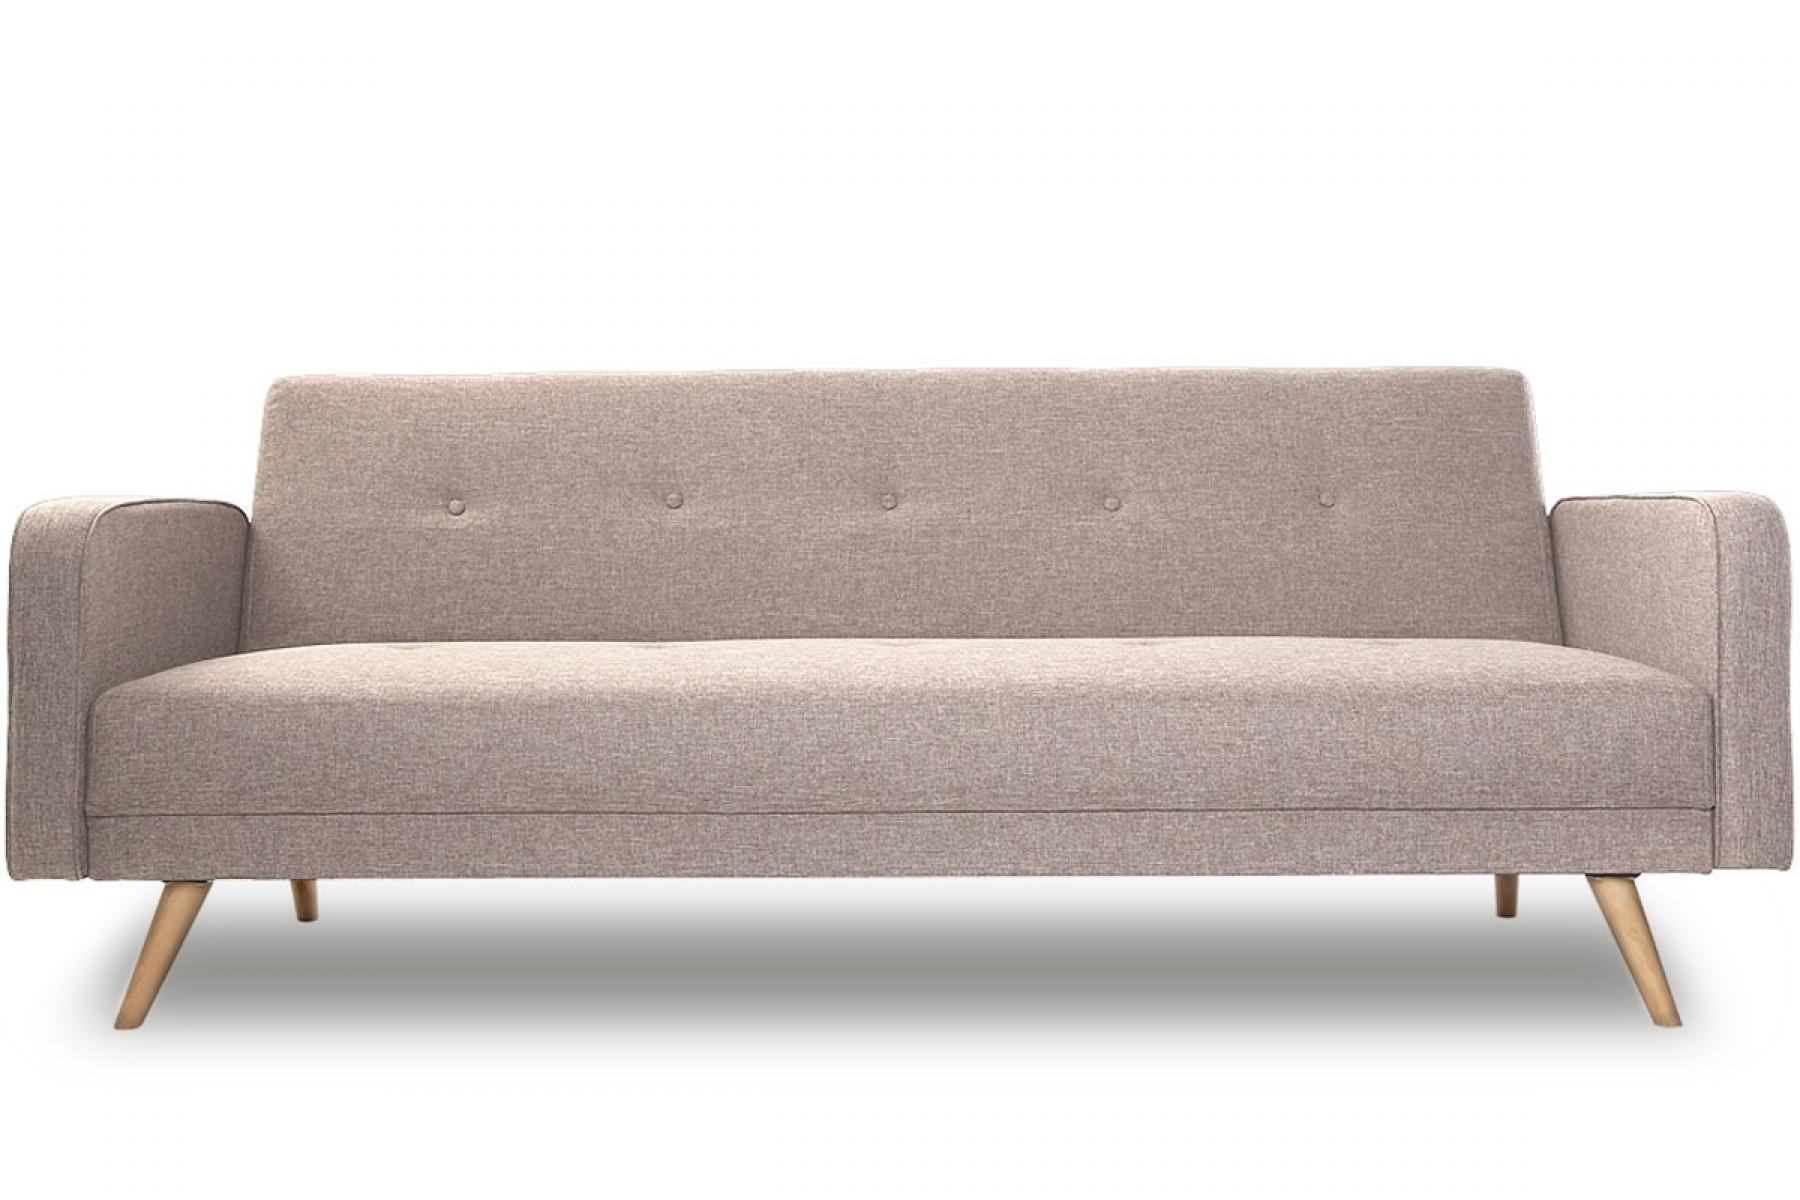 photos canap lit design scandinave. Black Bedroom Furniture Sets. Home Design Ideas